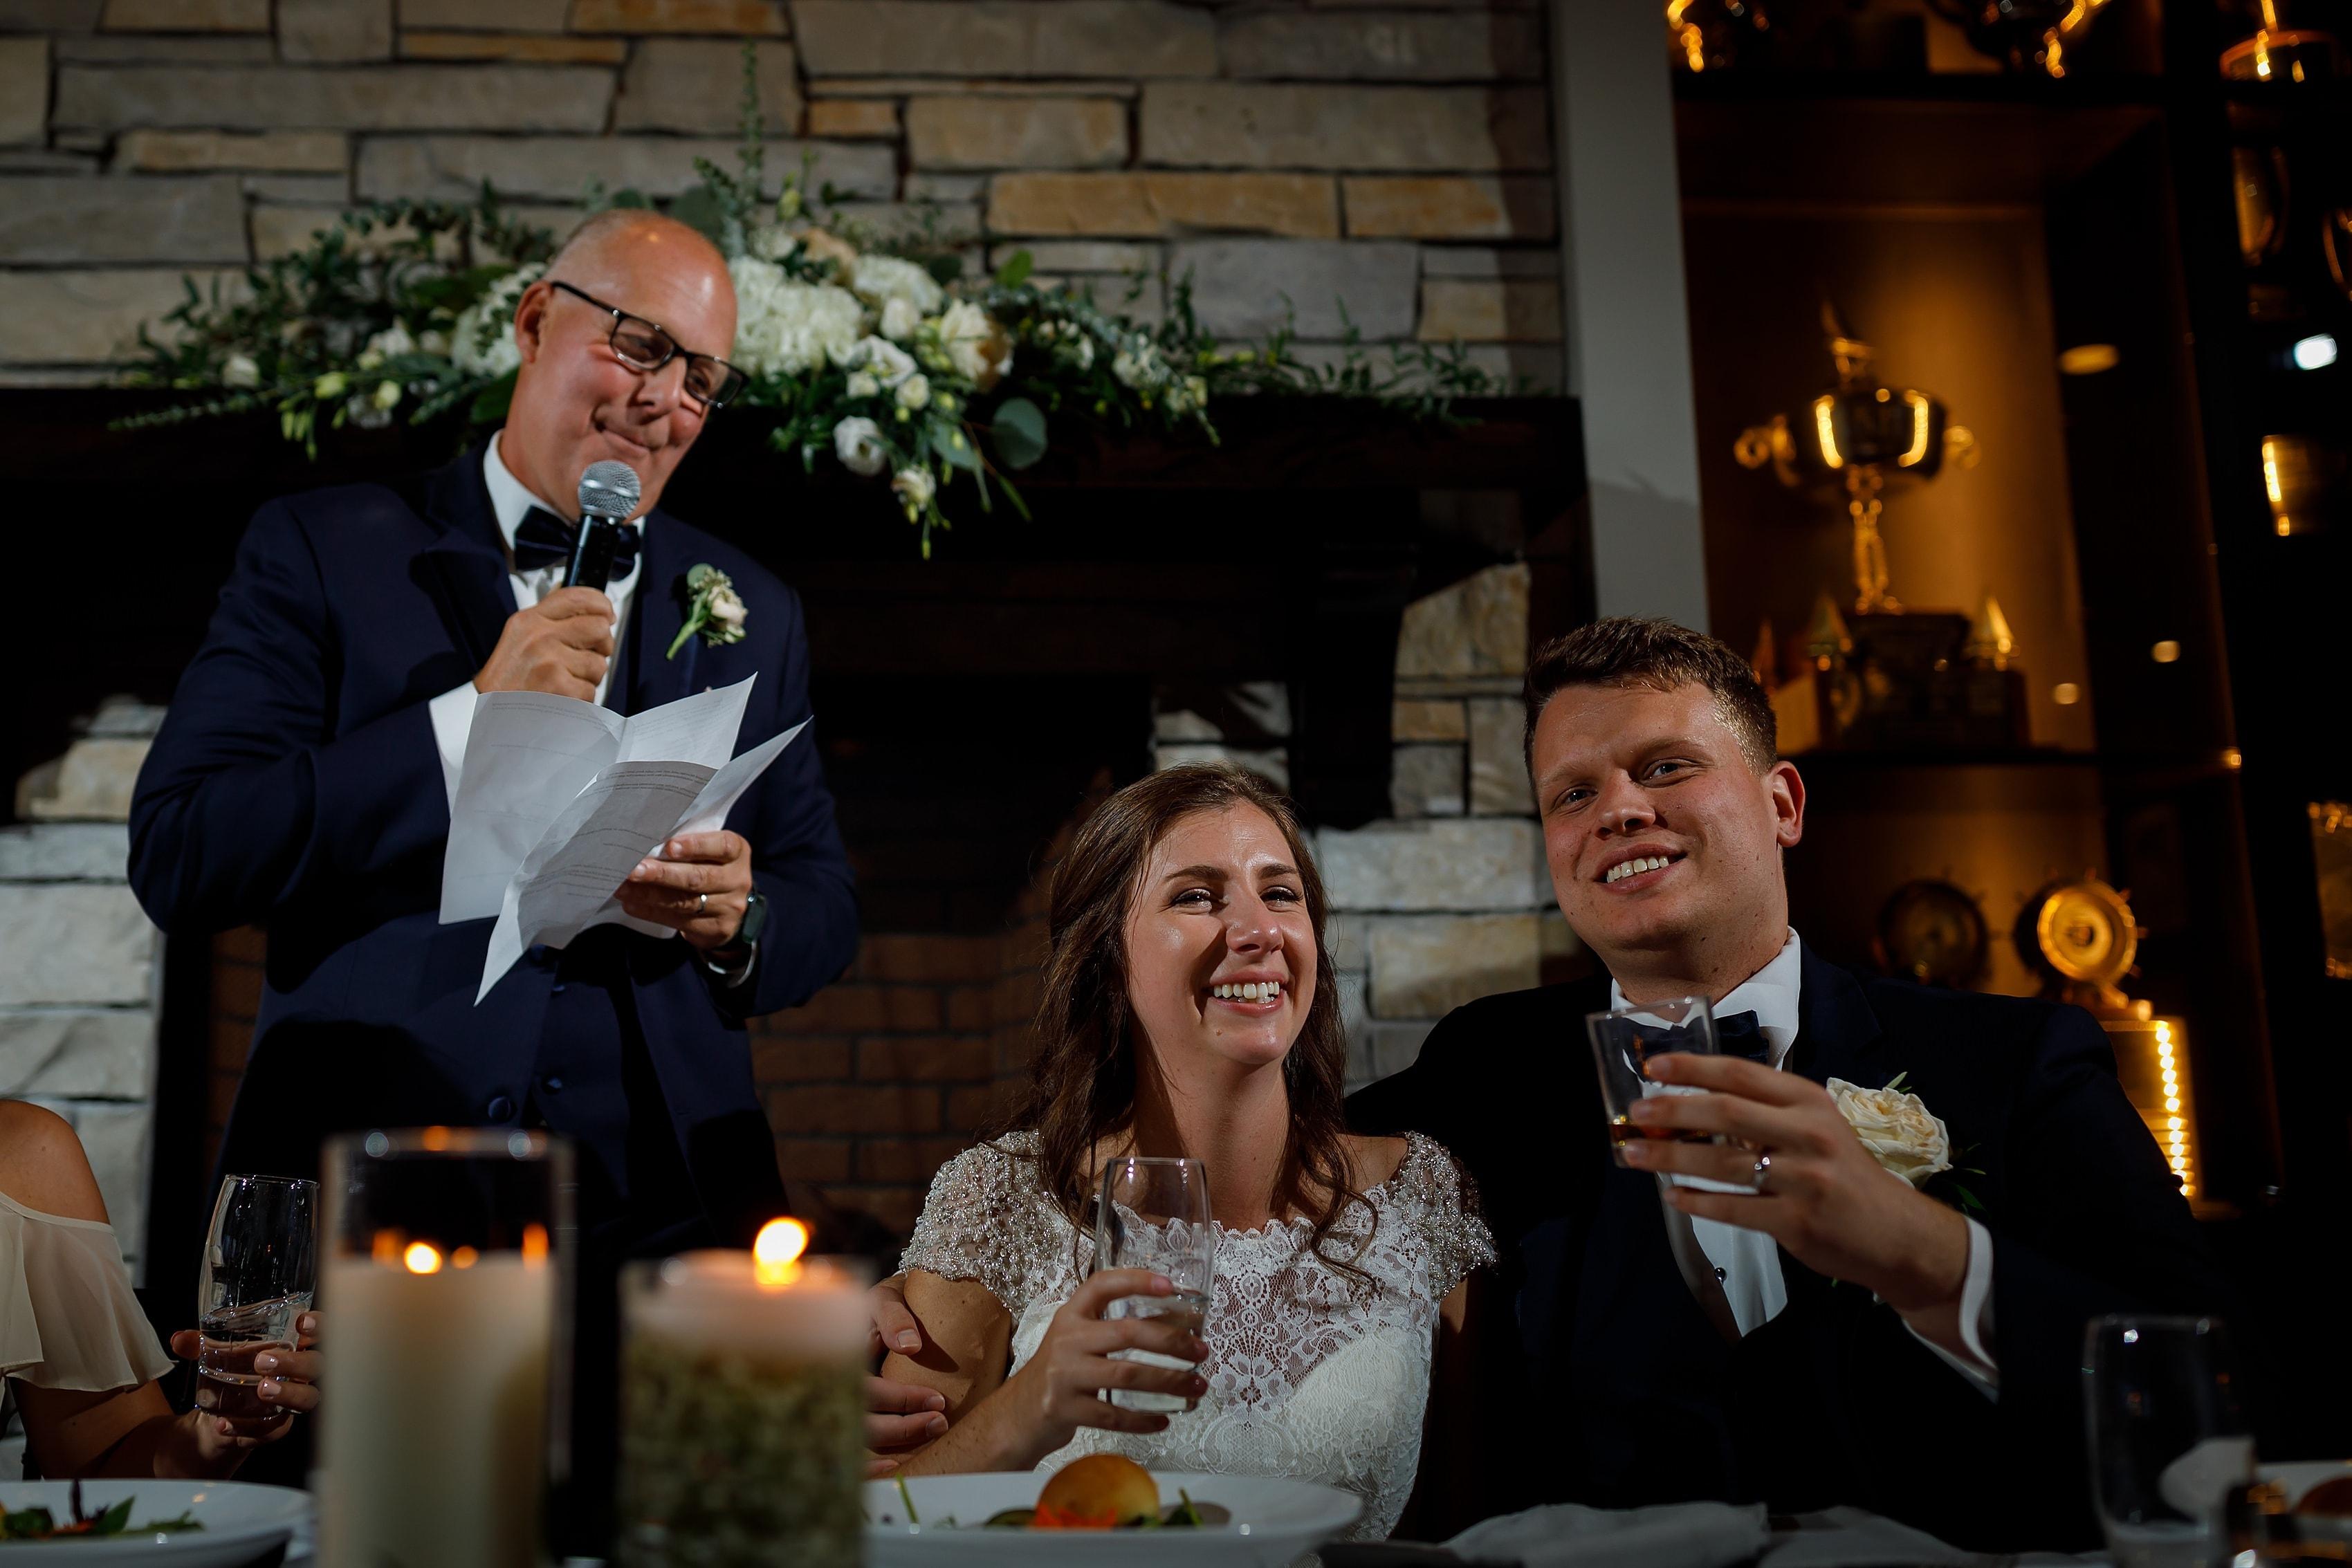 Father of the bride toast at Lake Geneva Yacht Club in Lake Geneva, Wisconsin